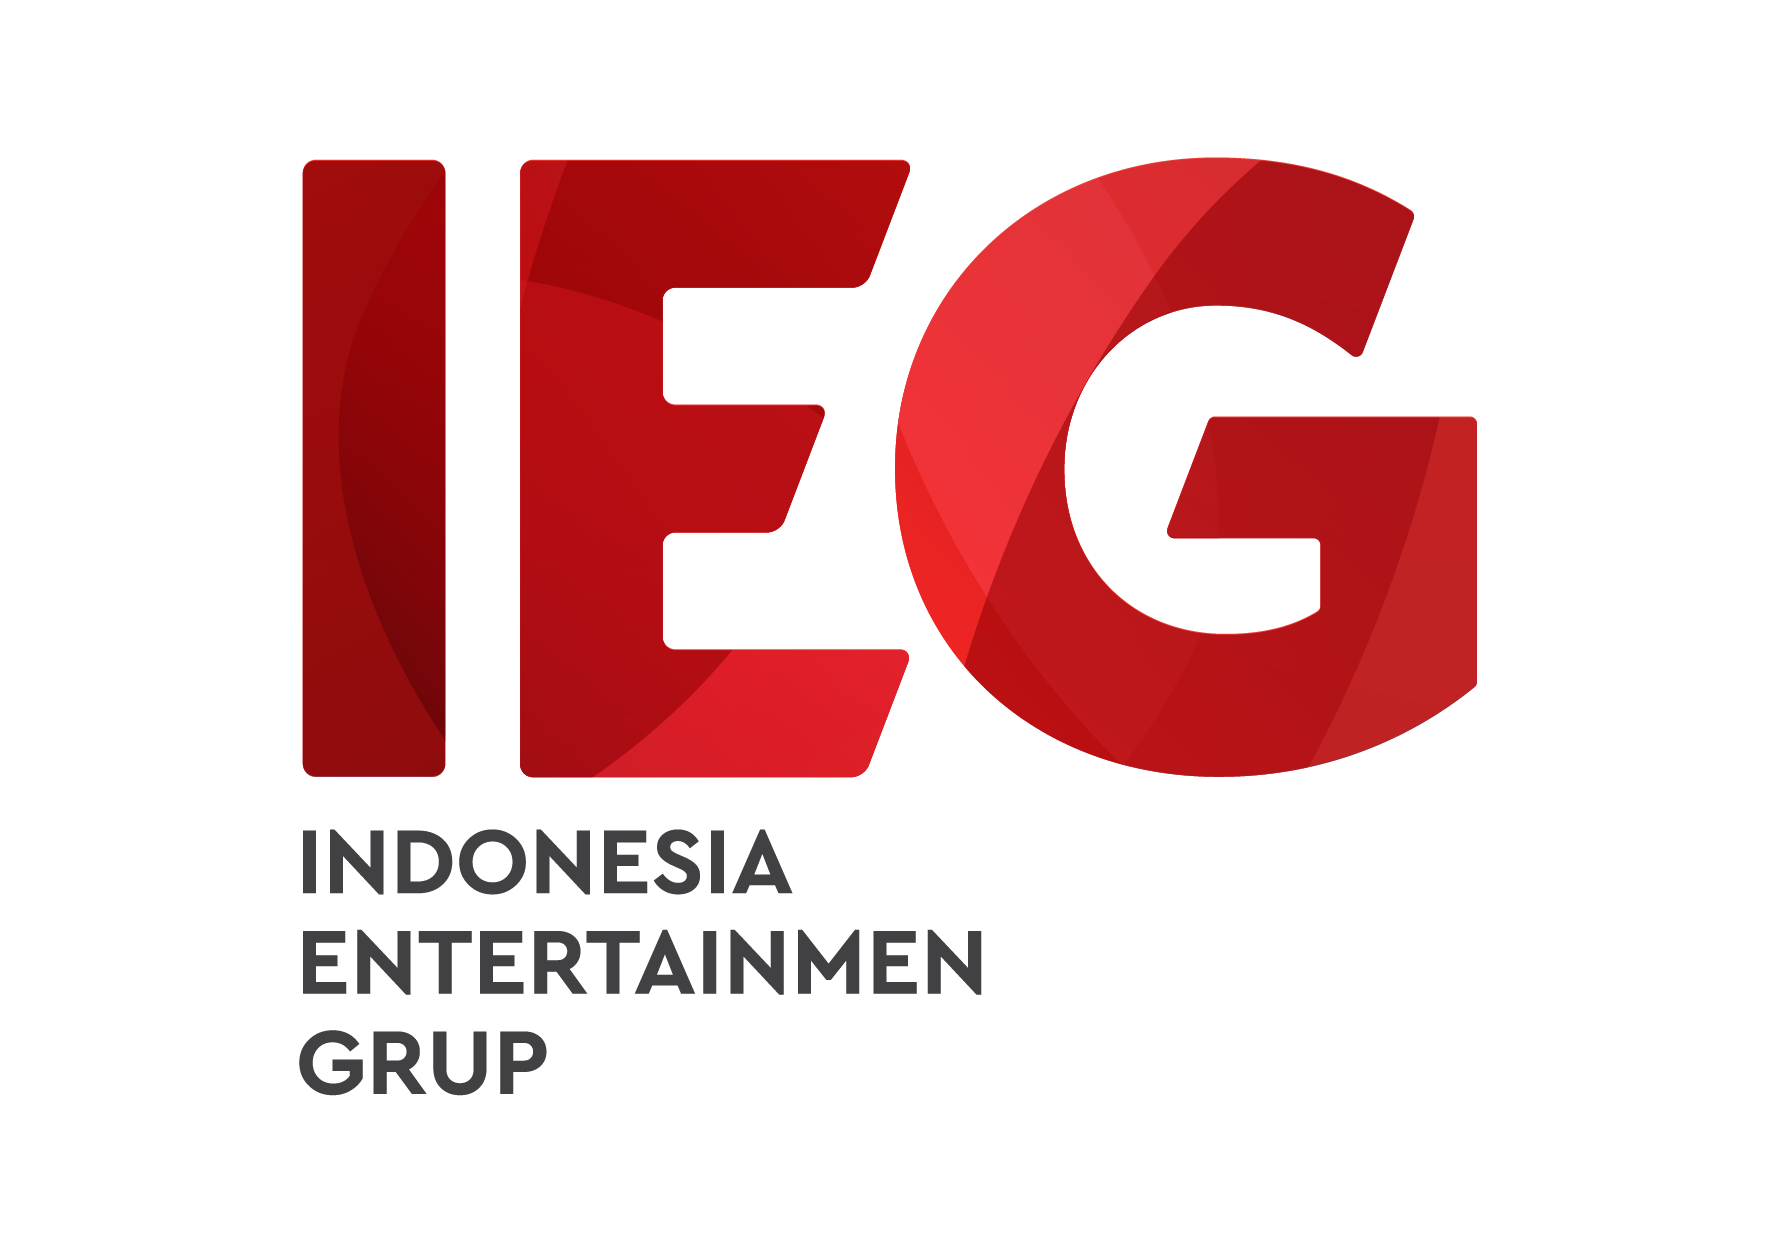 Indonesia Entertainmen Group